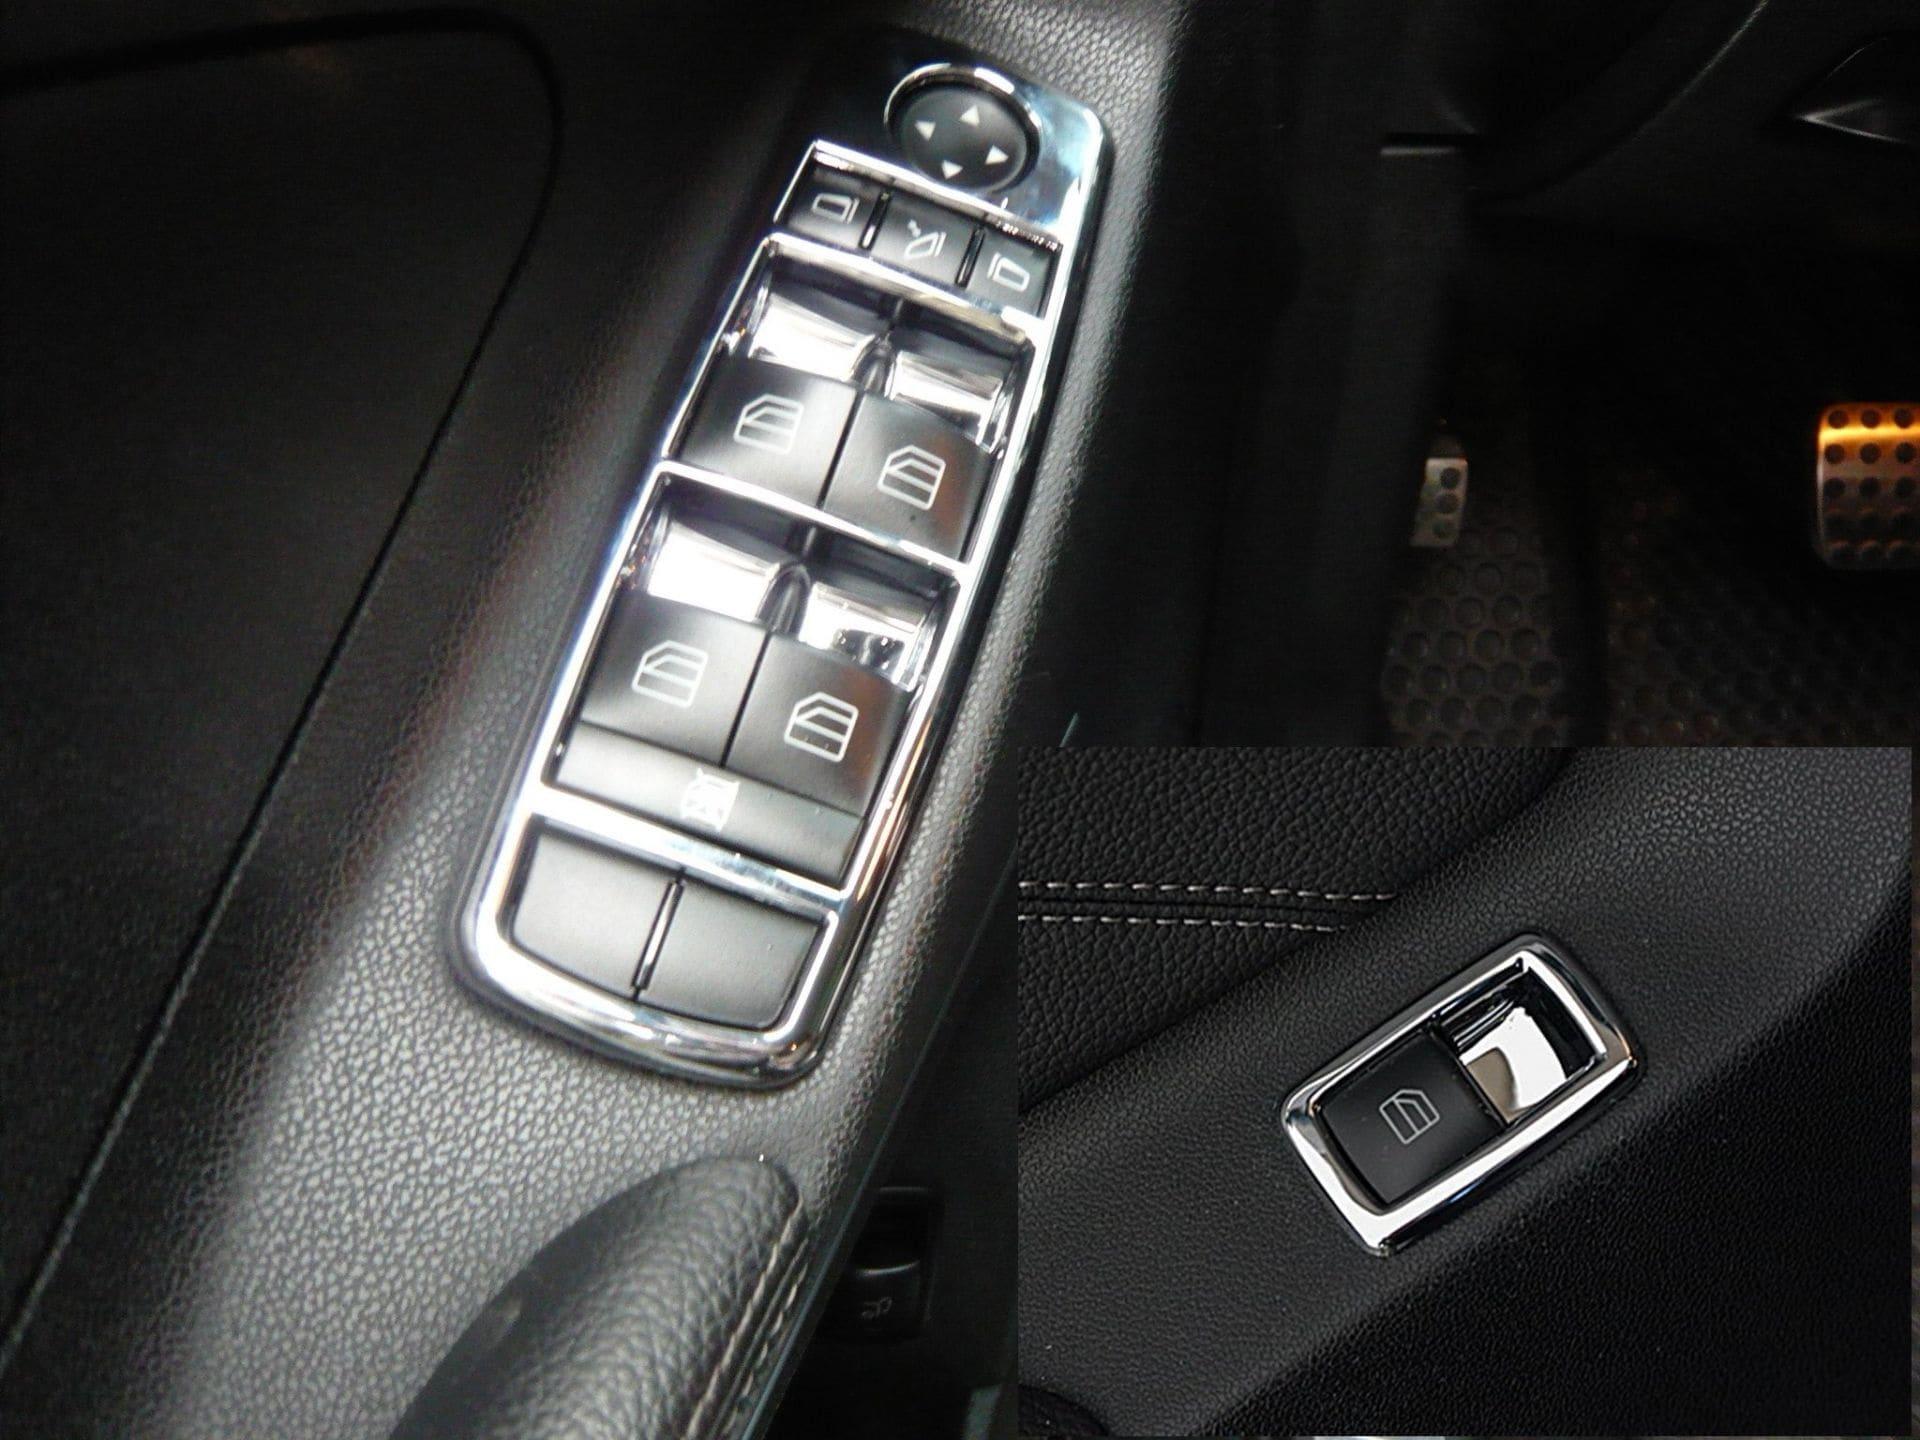 Kromad ram till knappsats - 5st delar - Mercedes Benz  W164 , X164